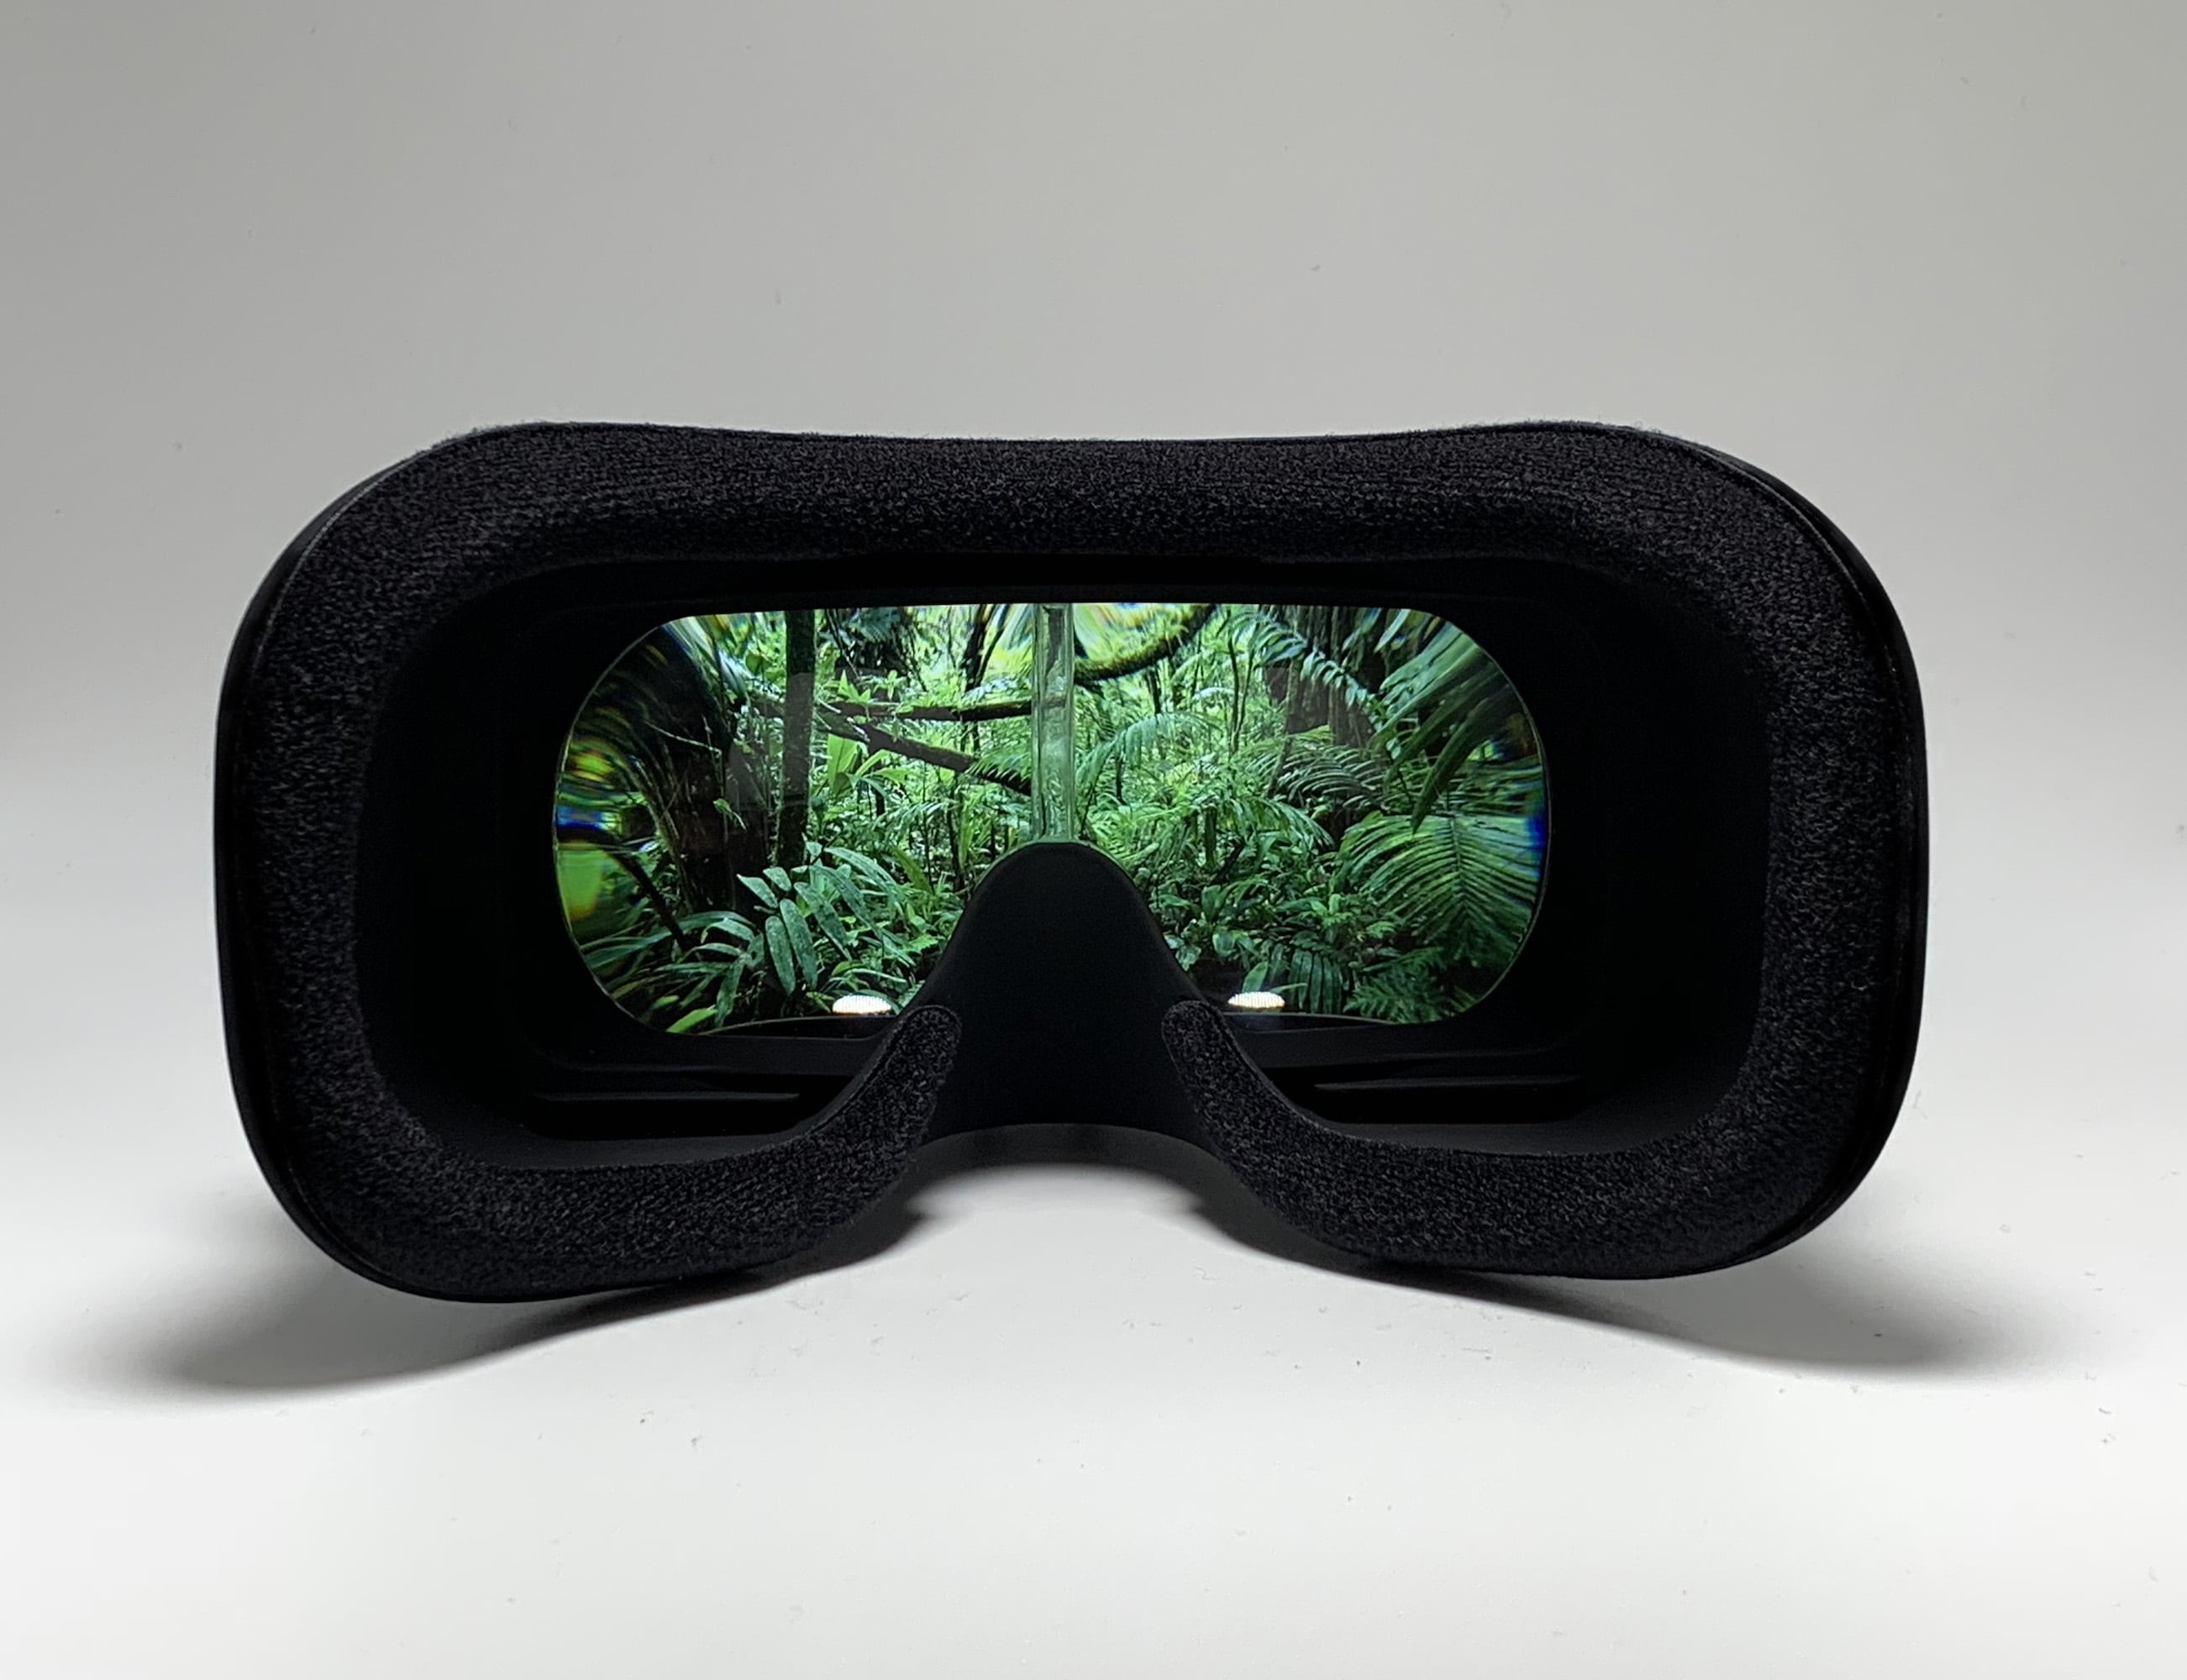 MagiMask High Definition AR Headset